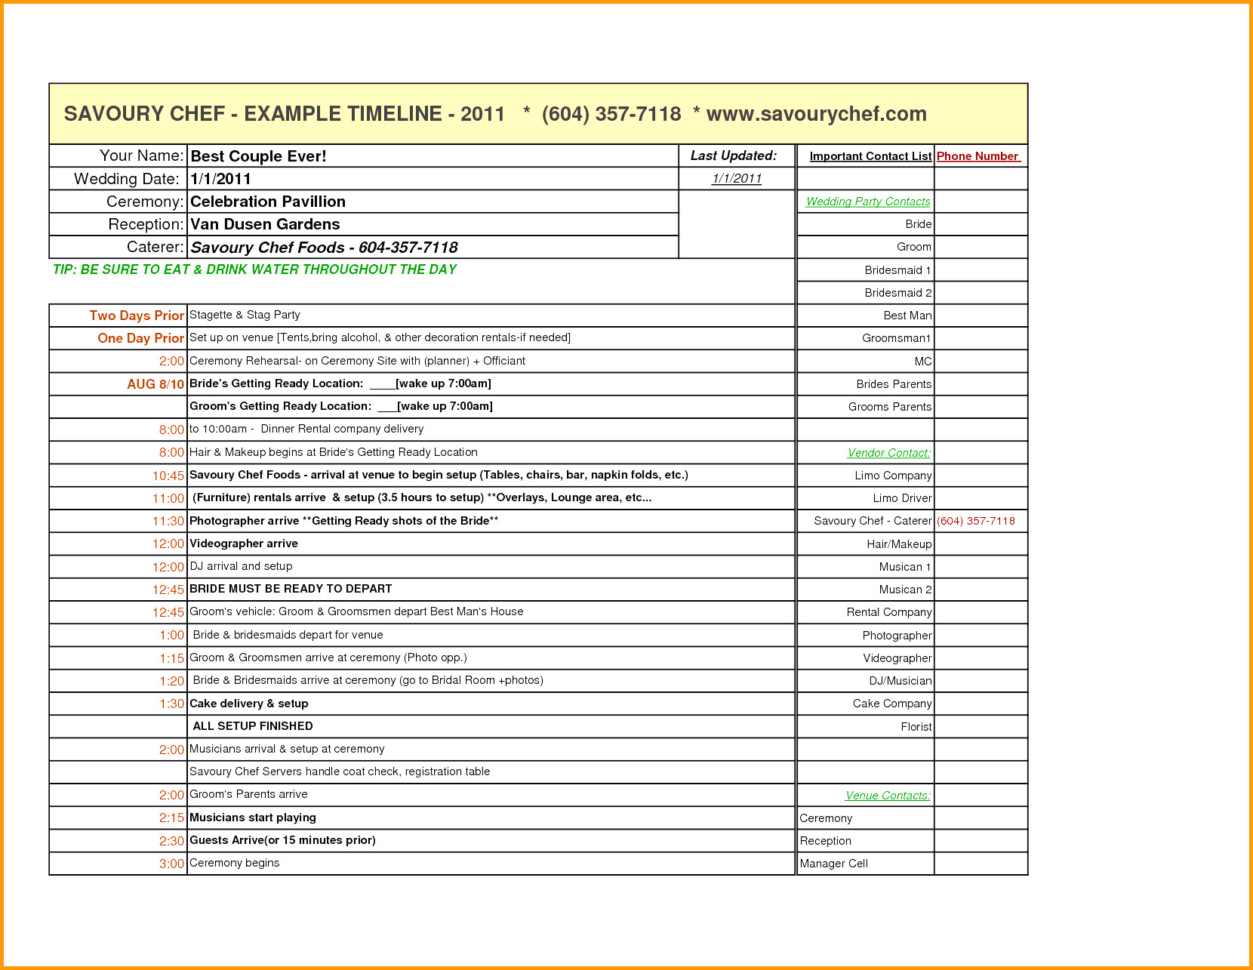 Best Wedding Guest List Spreadsheet Download In Best Wedding Guest List Spreadsheet Download 0  Discover China Townsf